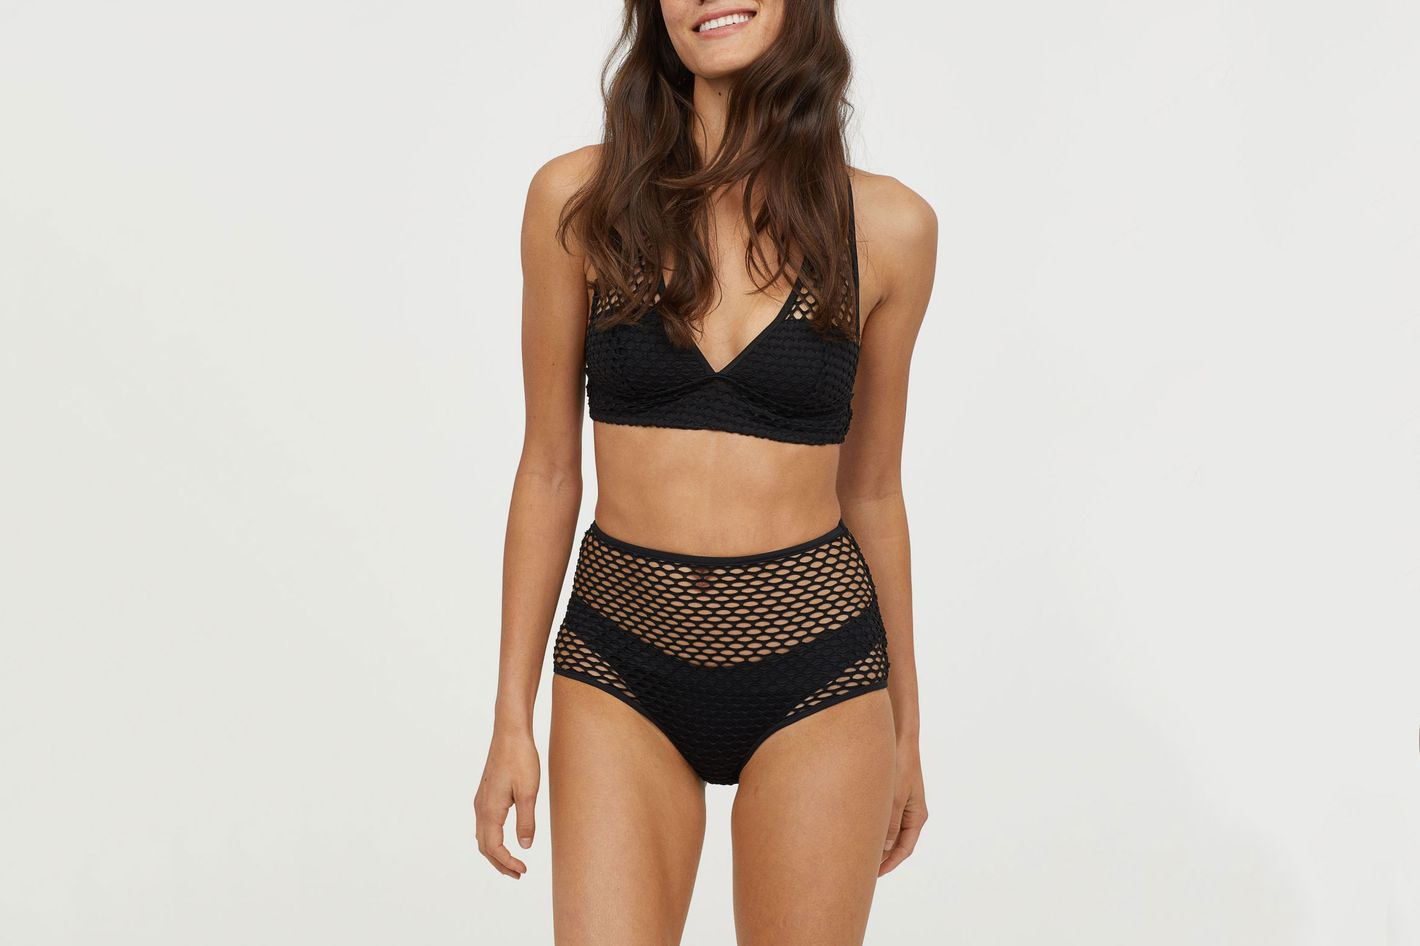 d5b57f8d289aa 21 Cute High-Waisted Bikinis to Wear This Summer